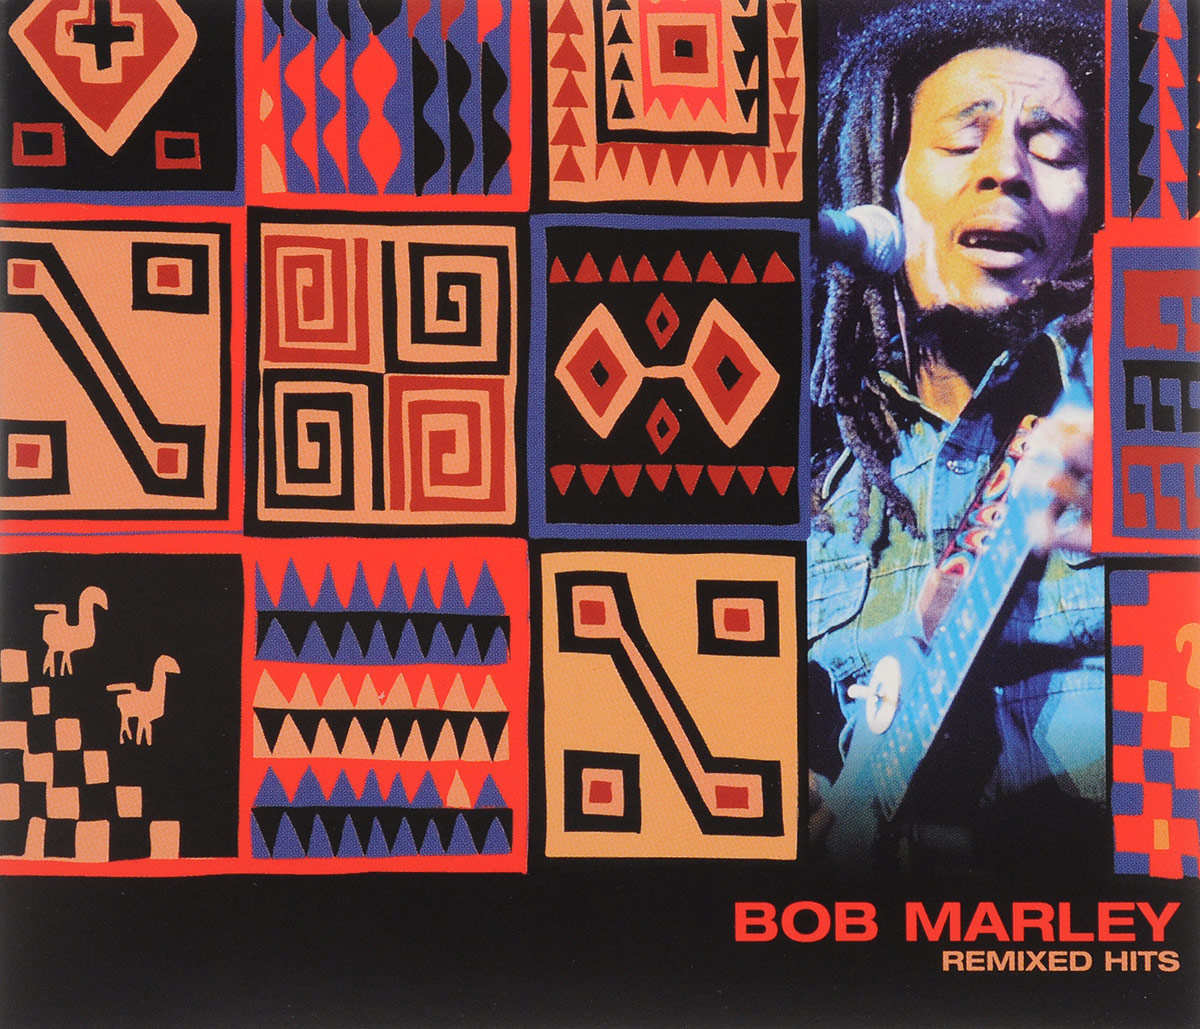 Bob Marley. Remix Hits